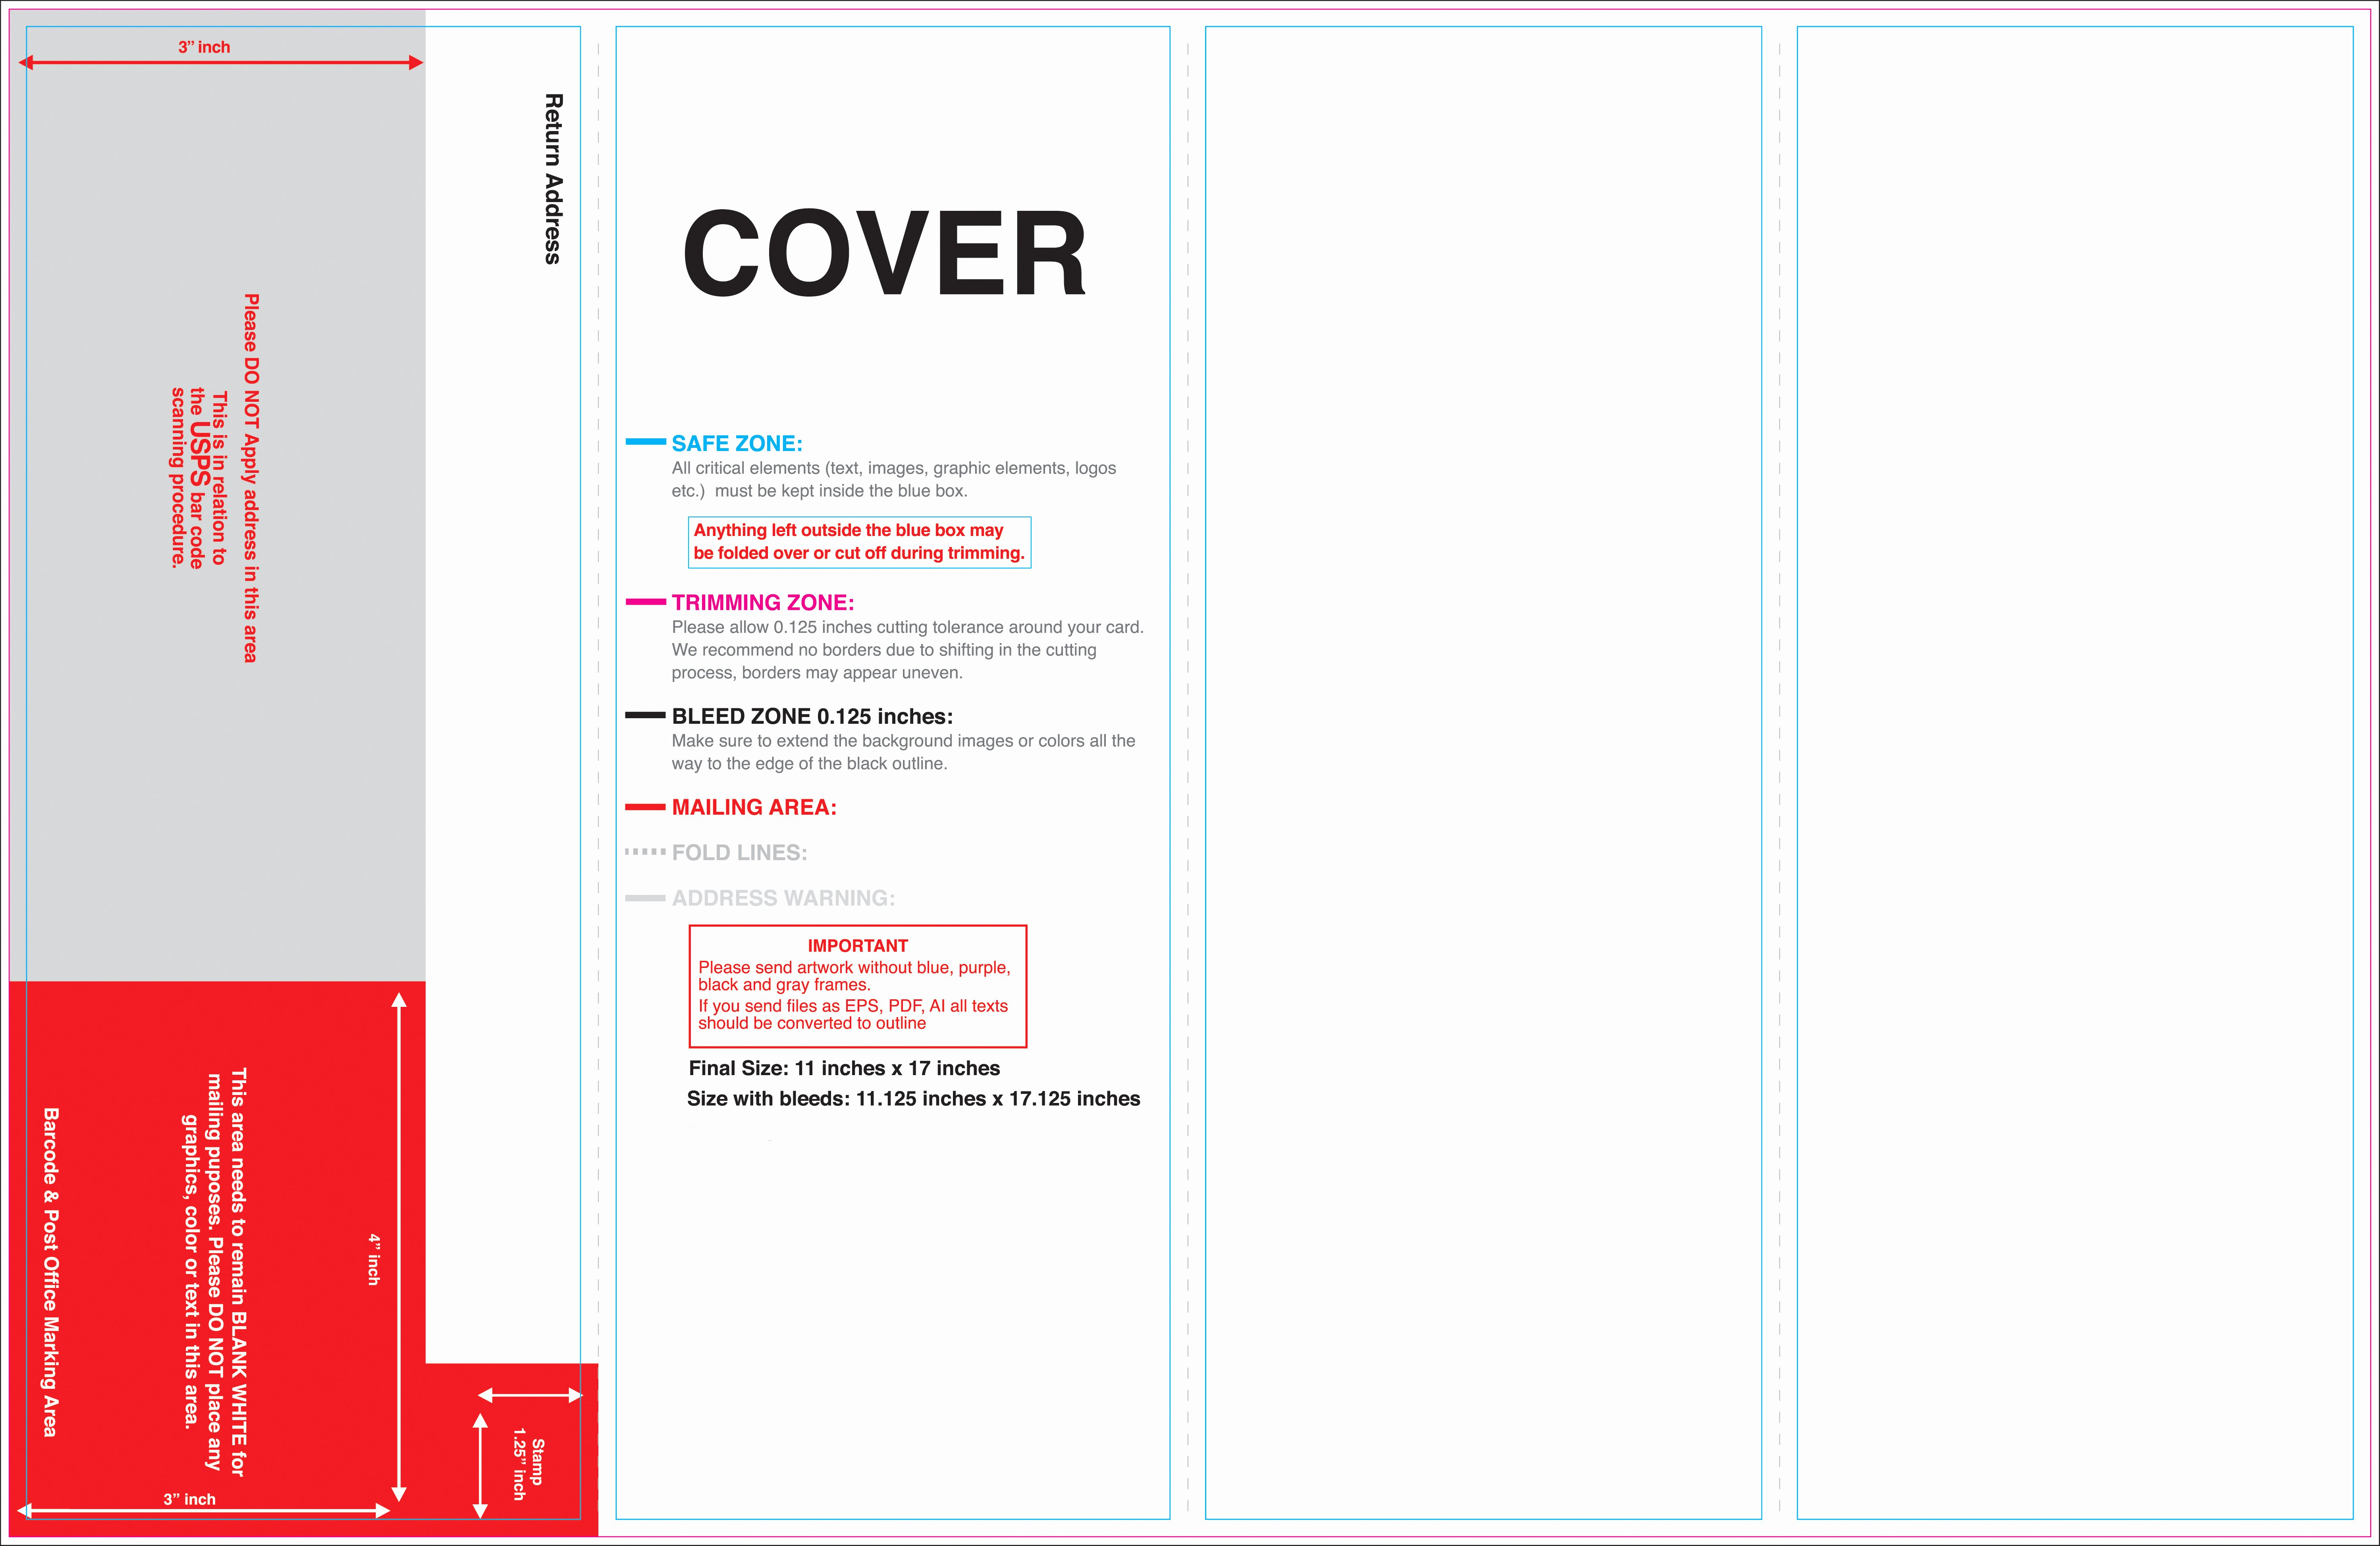 11x17 Trifold Brochure Template Lovely 99 11x17 Half Fold Brochure Template Free Bi Fold